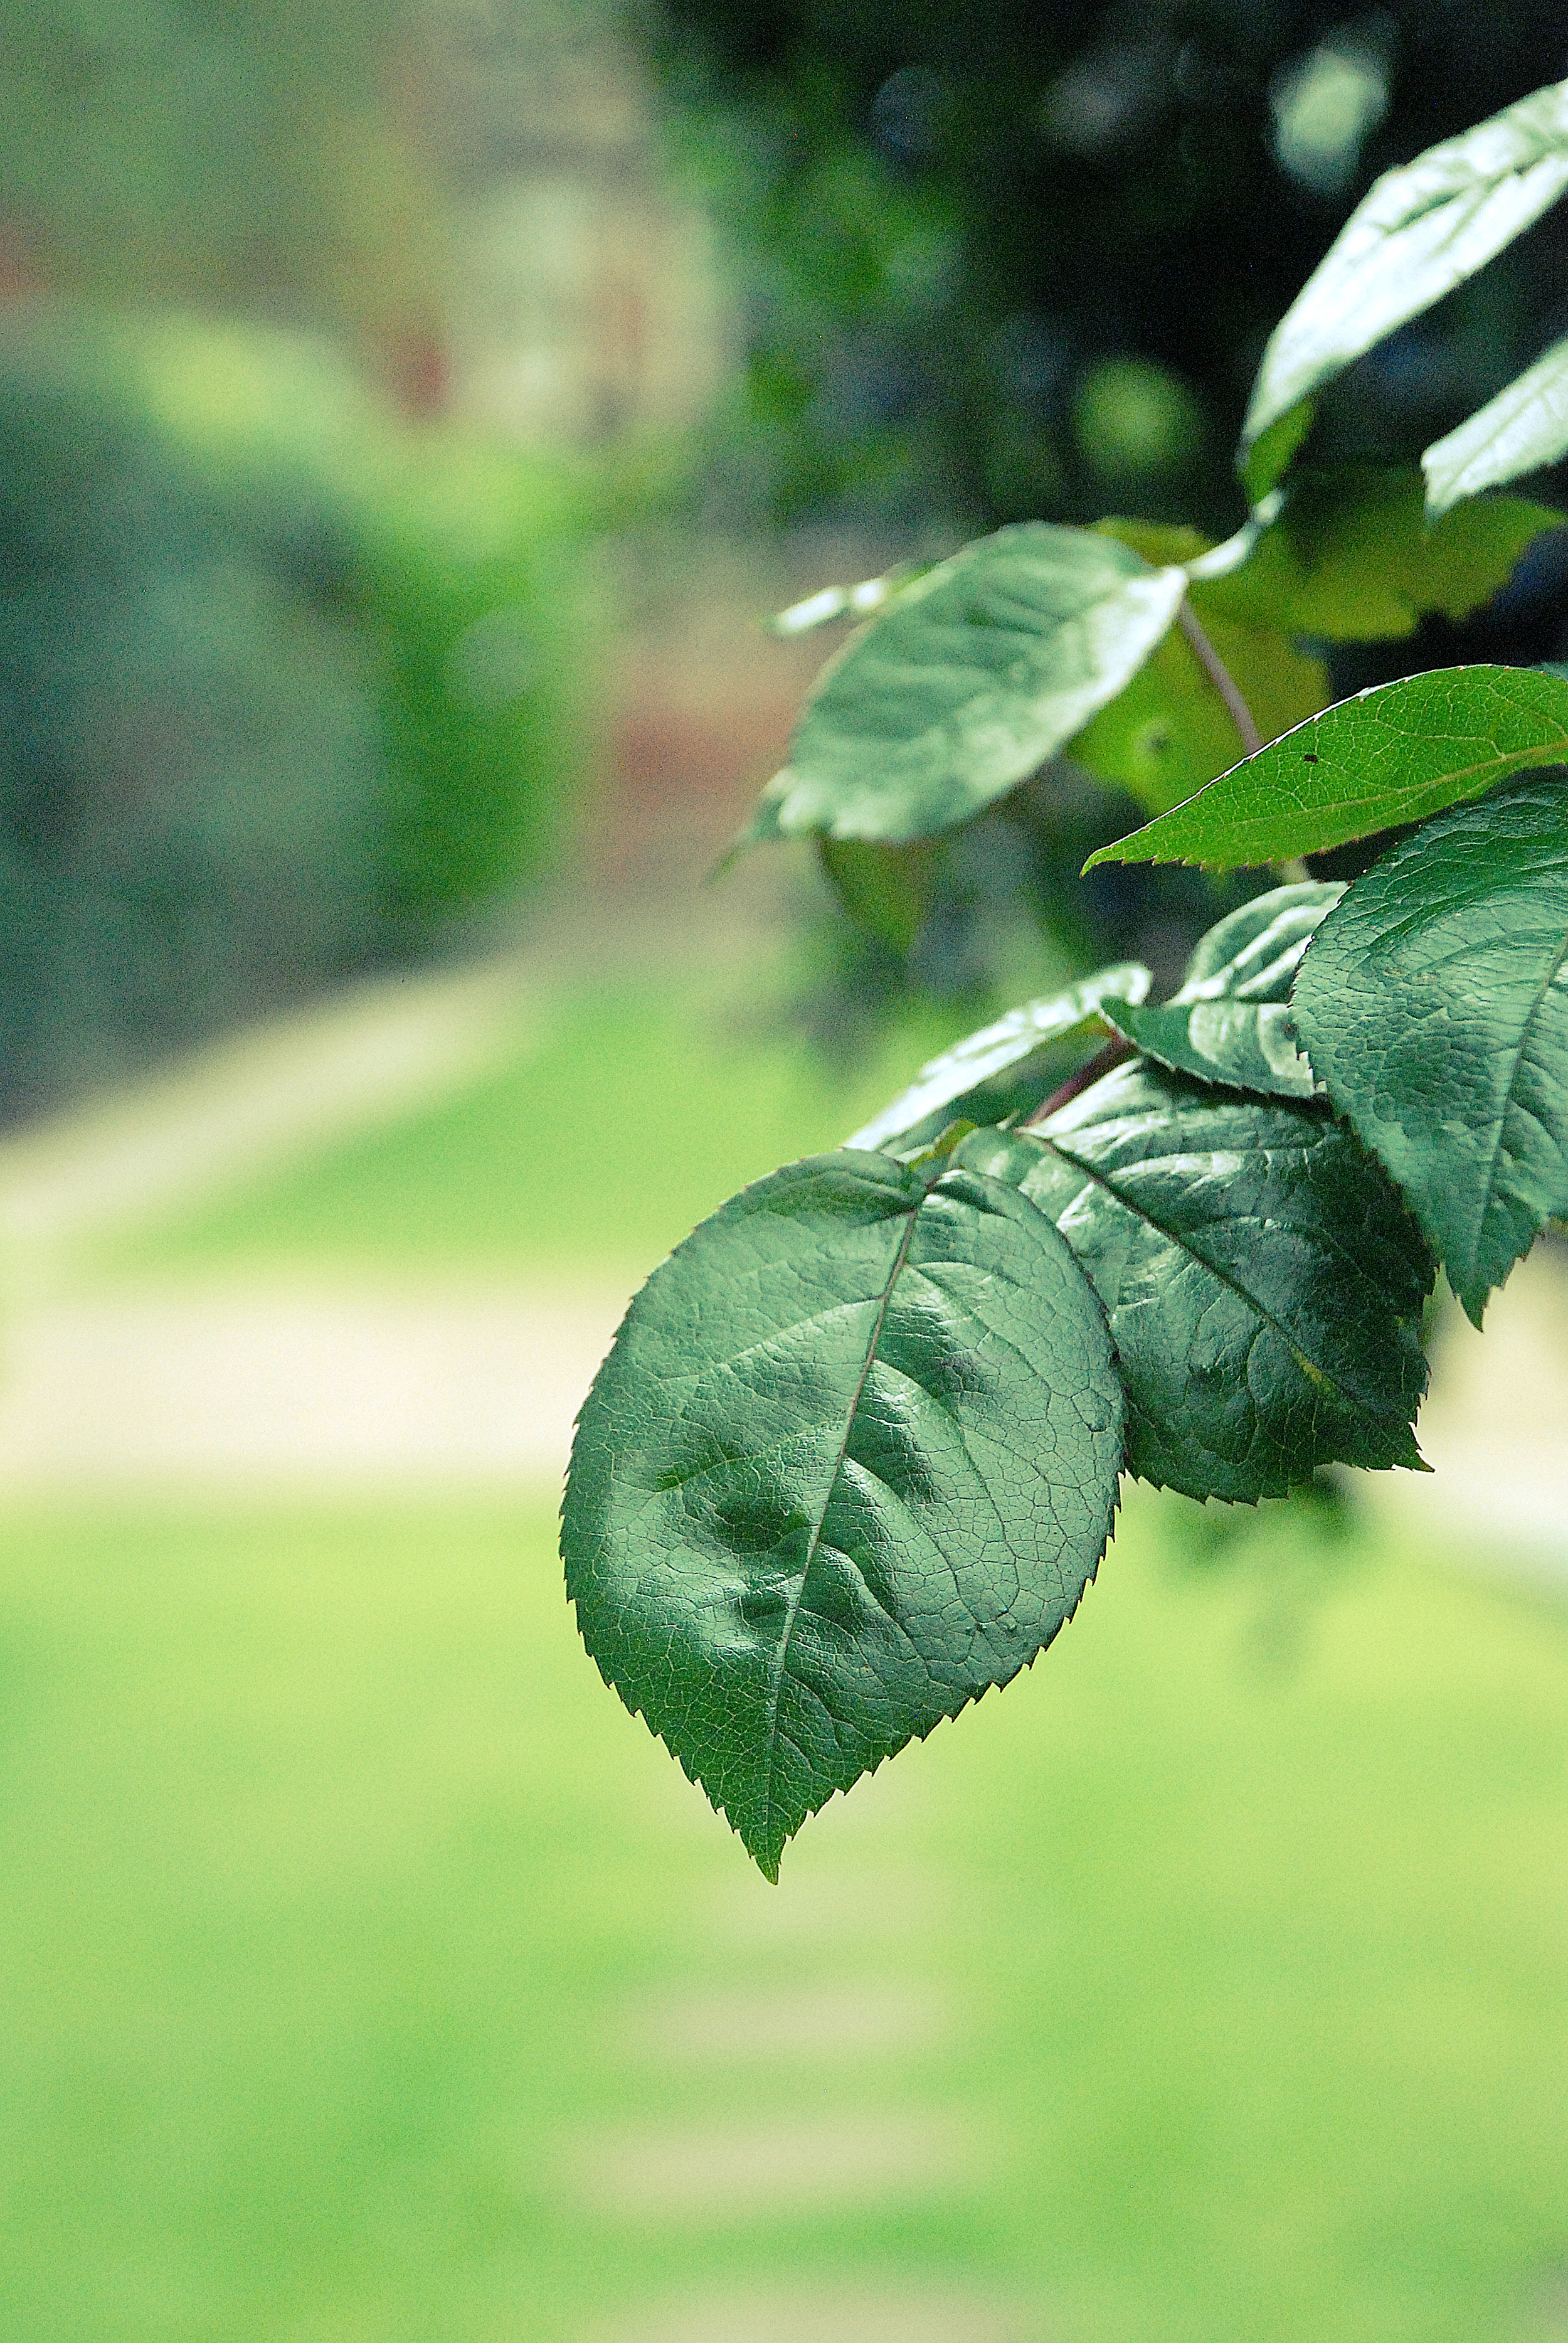 leaf close up.jpg